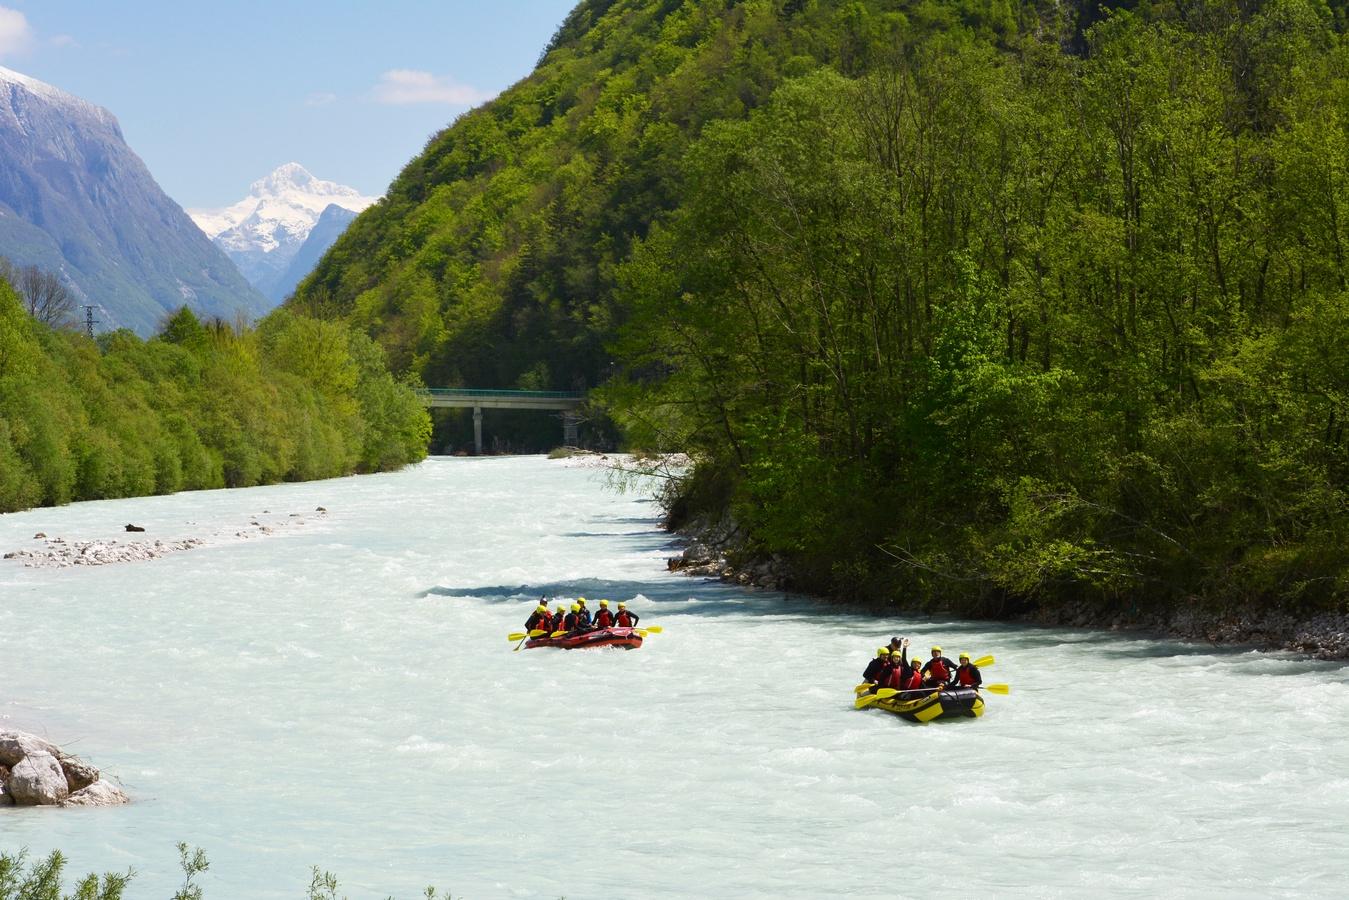 OKOLICA-Reka soča, rafting, Triglav